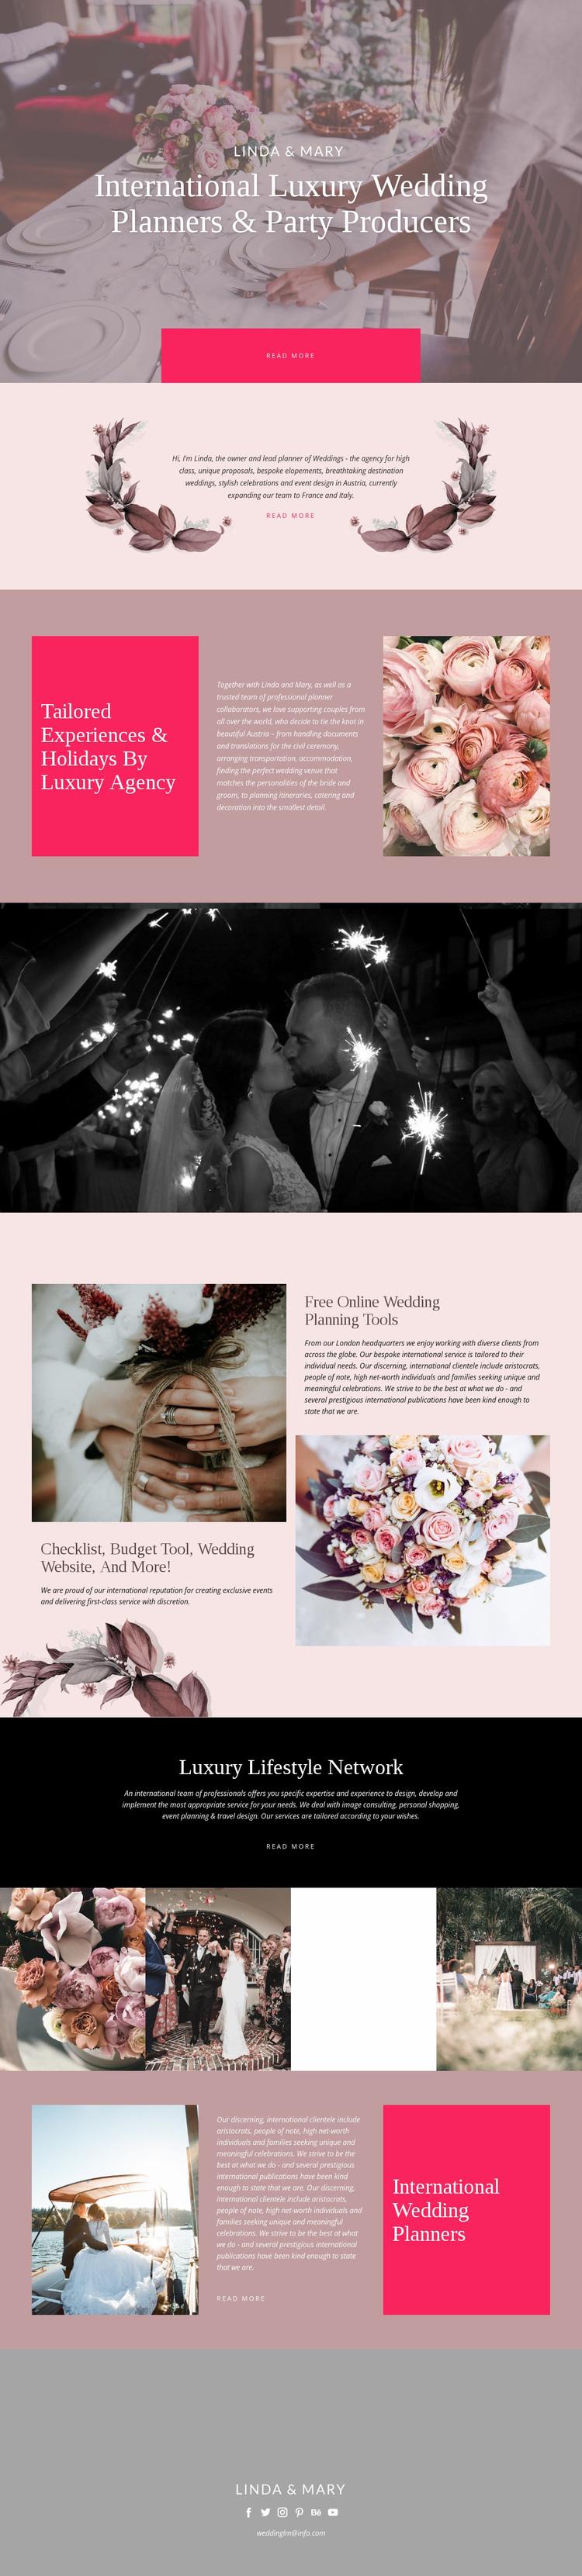 Luxury Wedding Website Design